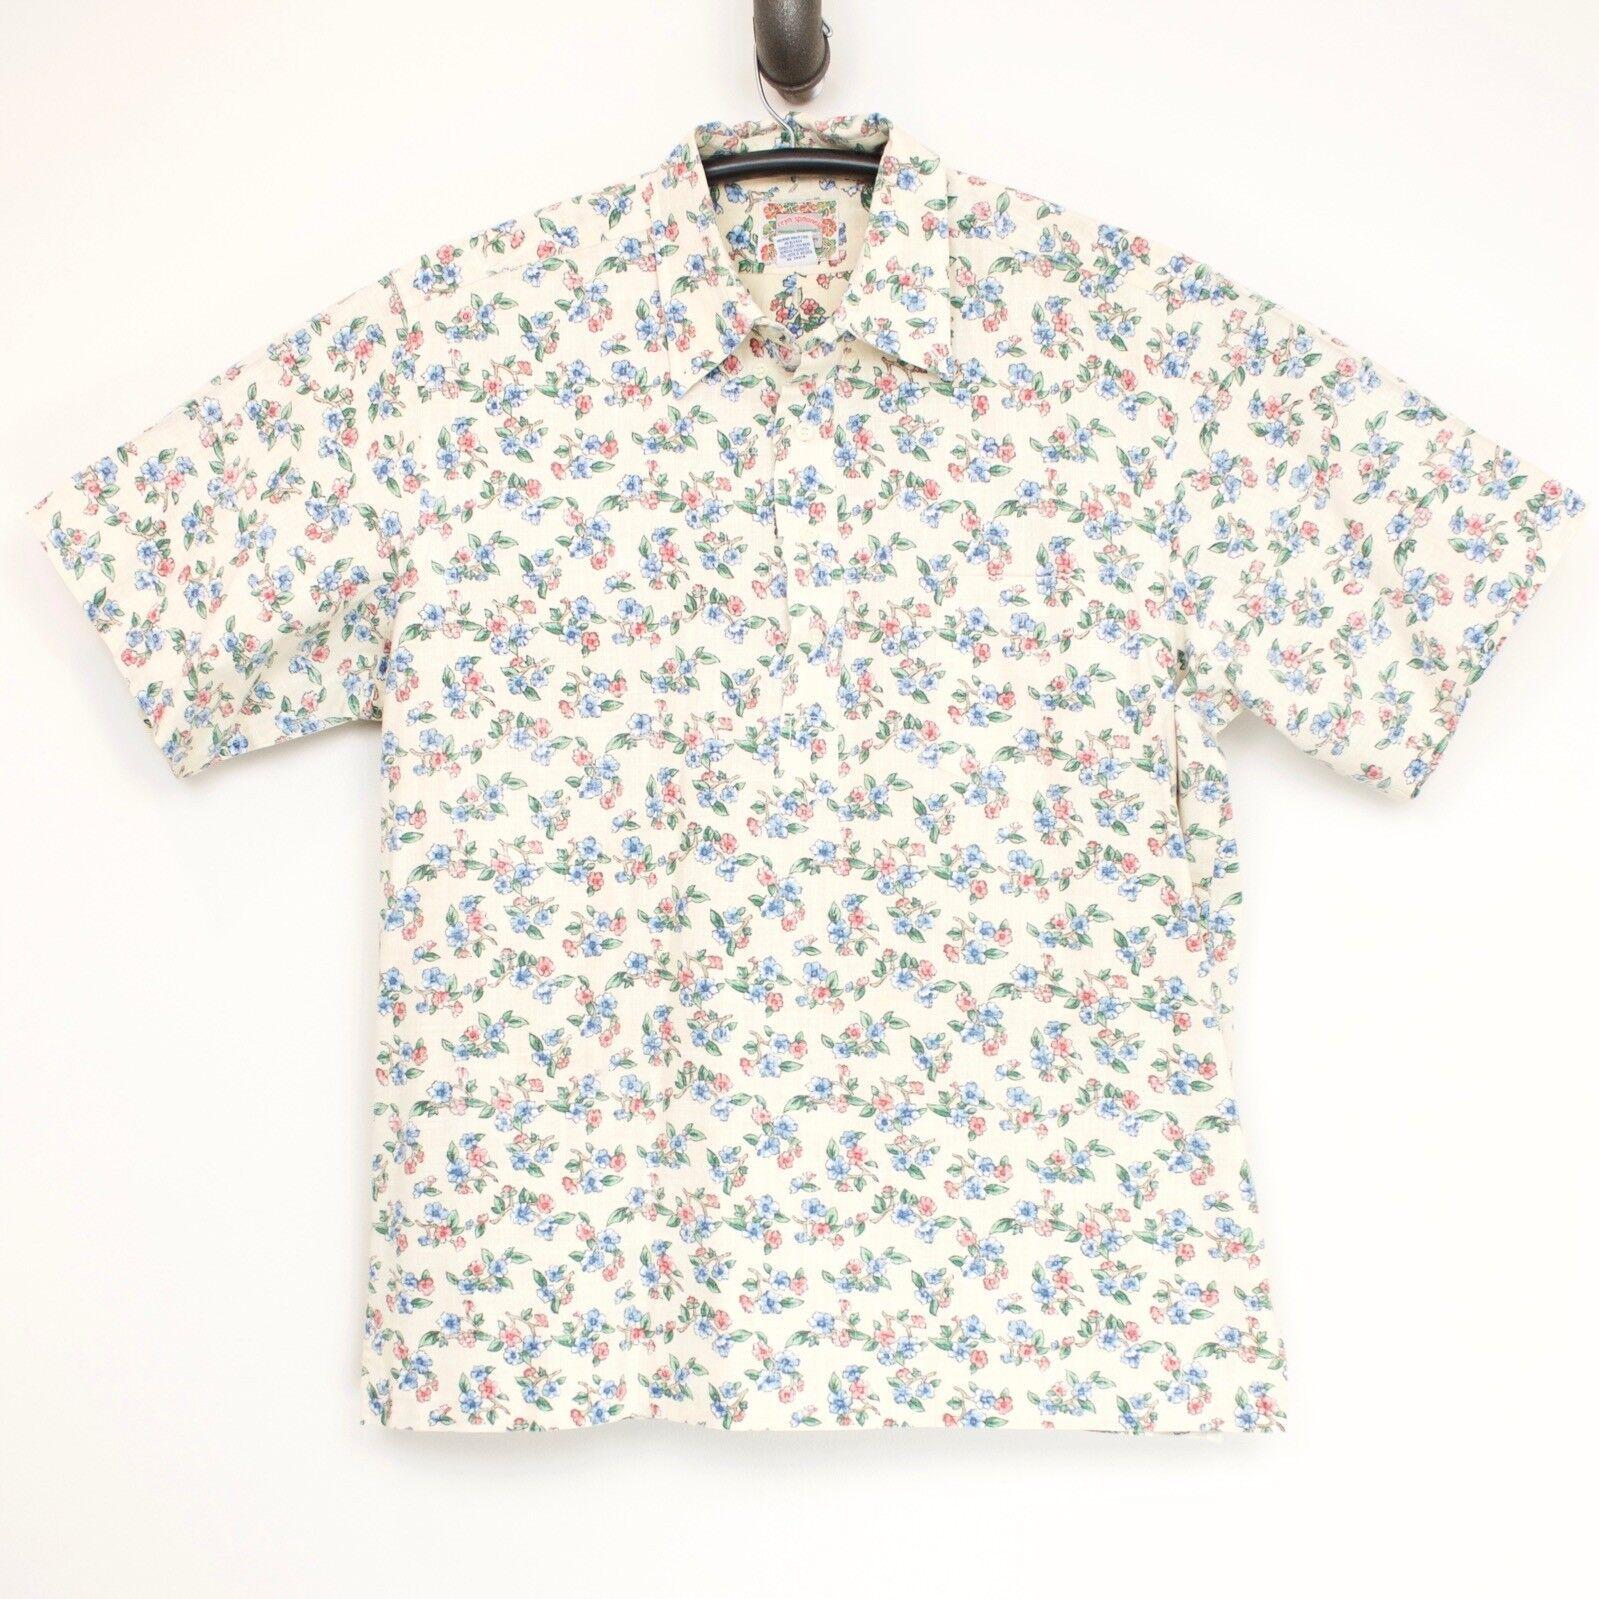 Reyn Spooner Mens Popeover Shirt XL Reverse Print Floral Cotton Blend Beige Pink